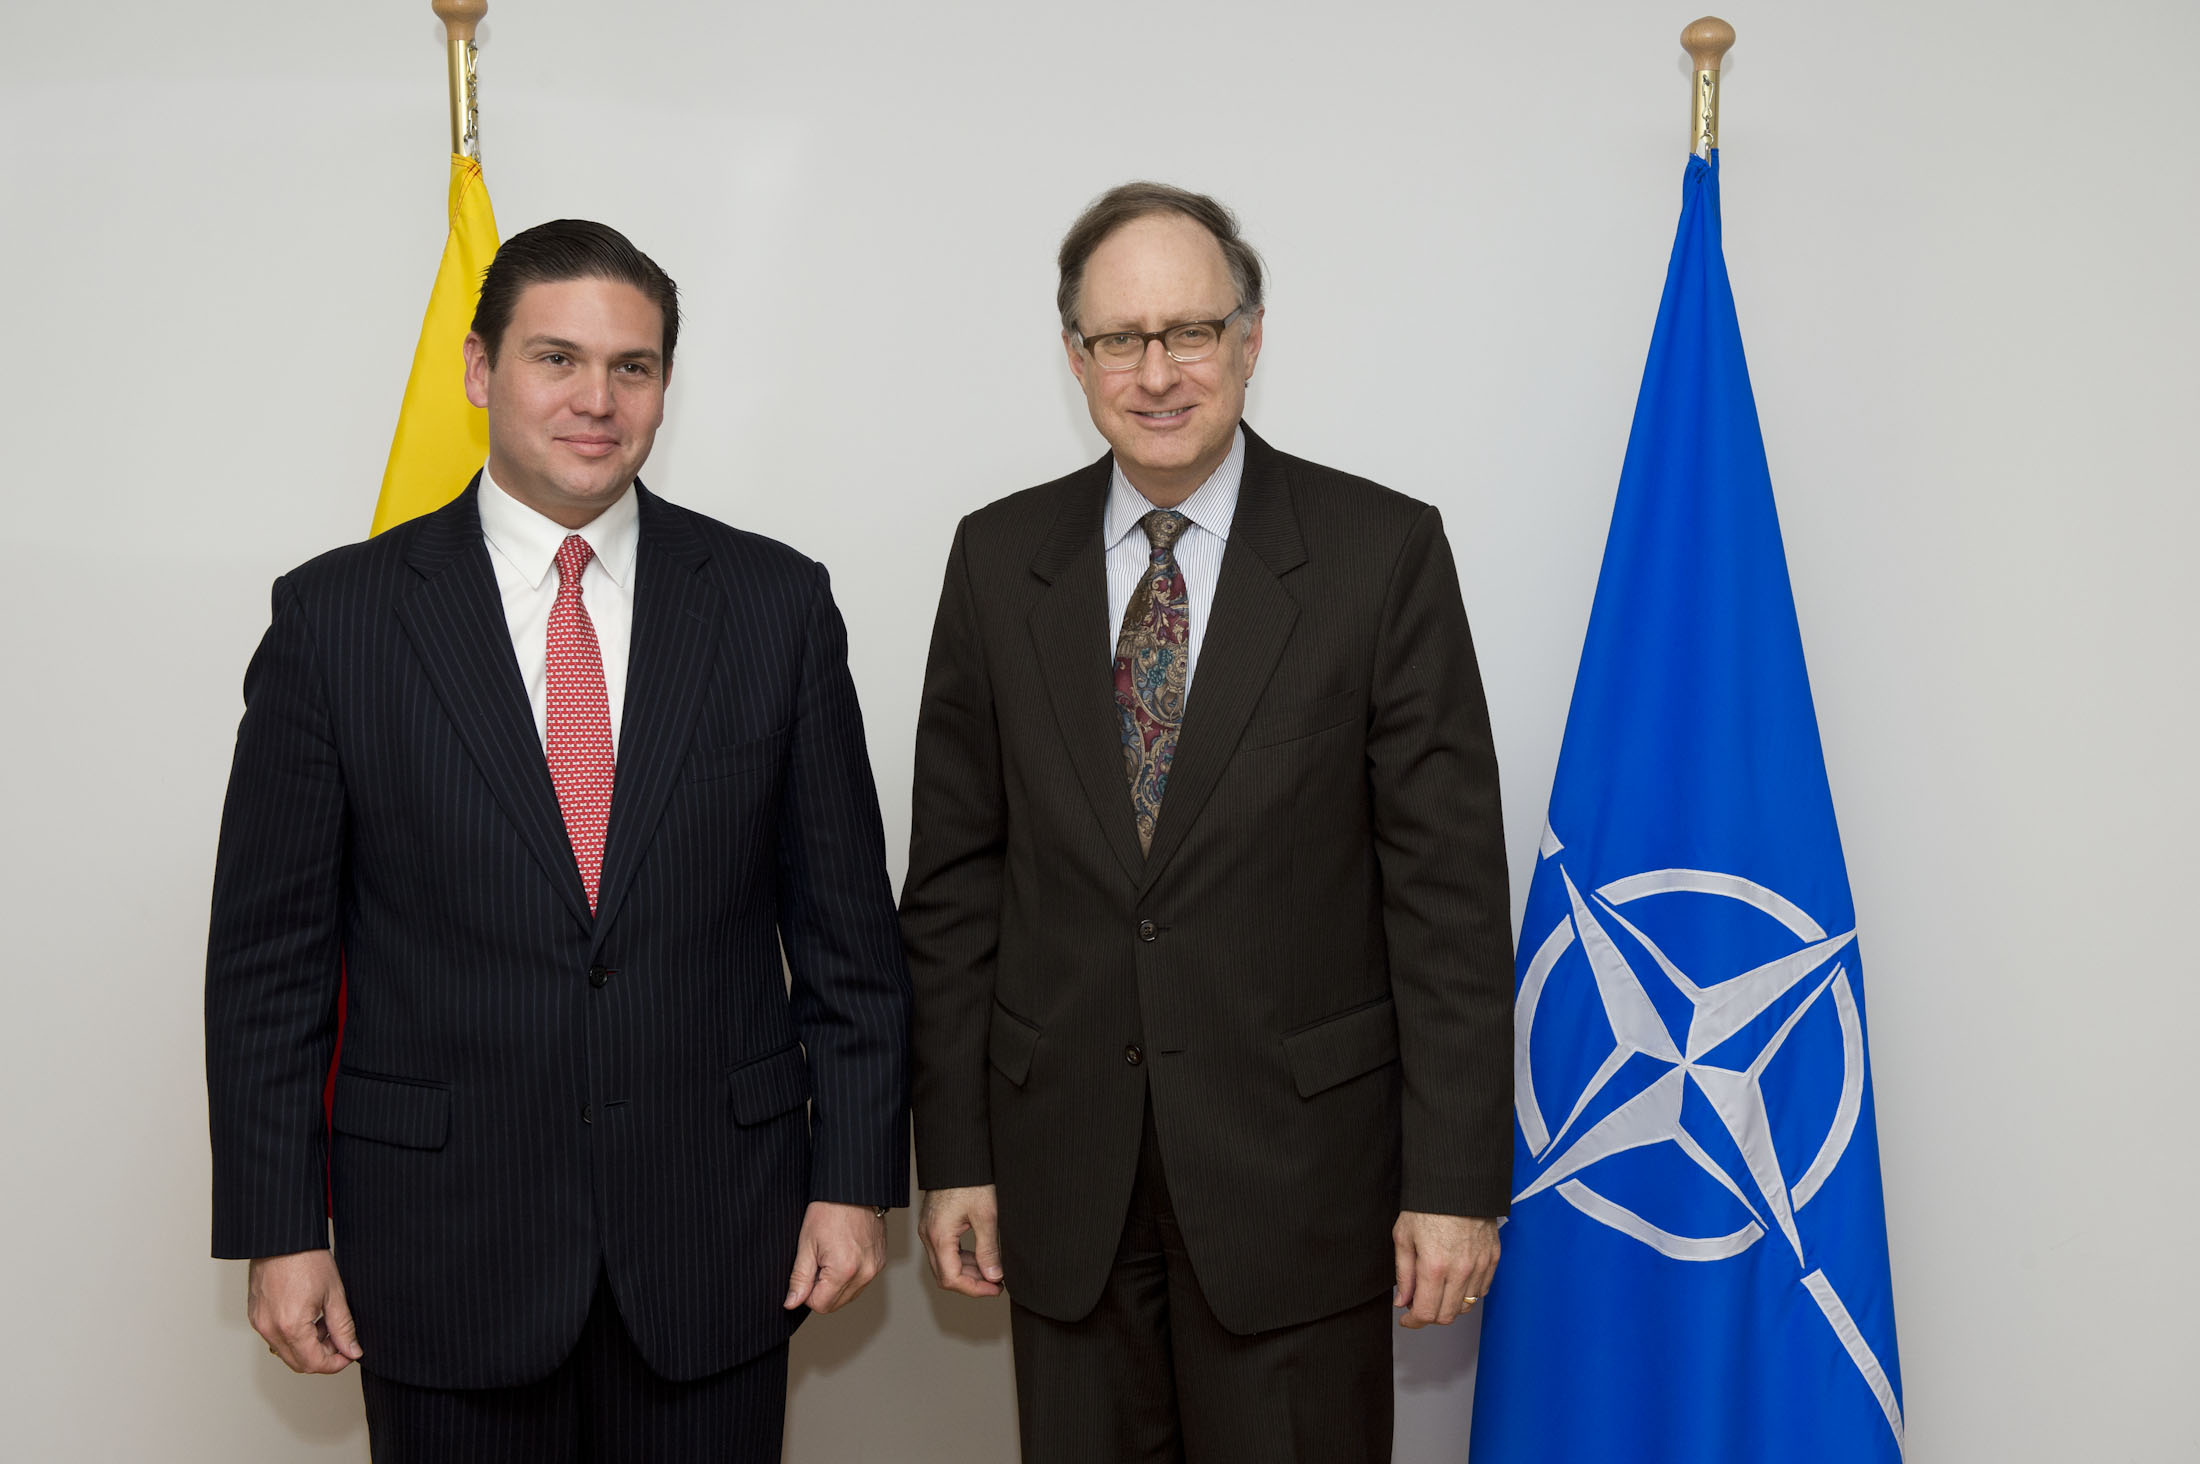 Colombian Minister of Defense Juan Carlos Pinzon and NATO Deputy Secretary General Ambassador Alexander Vershbow, June 25, 2013